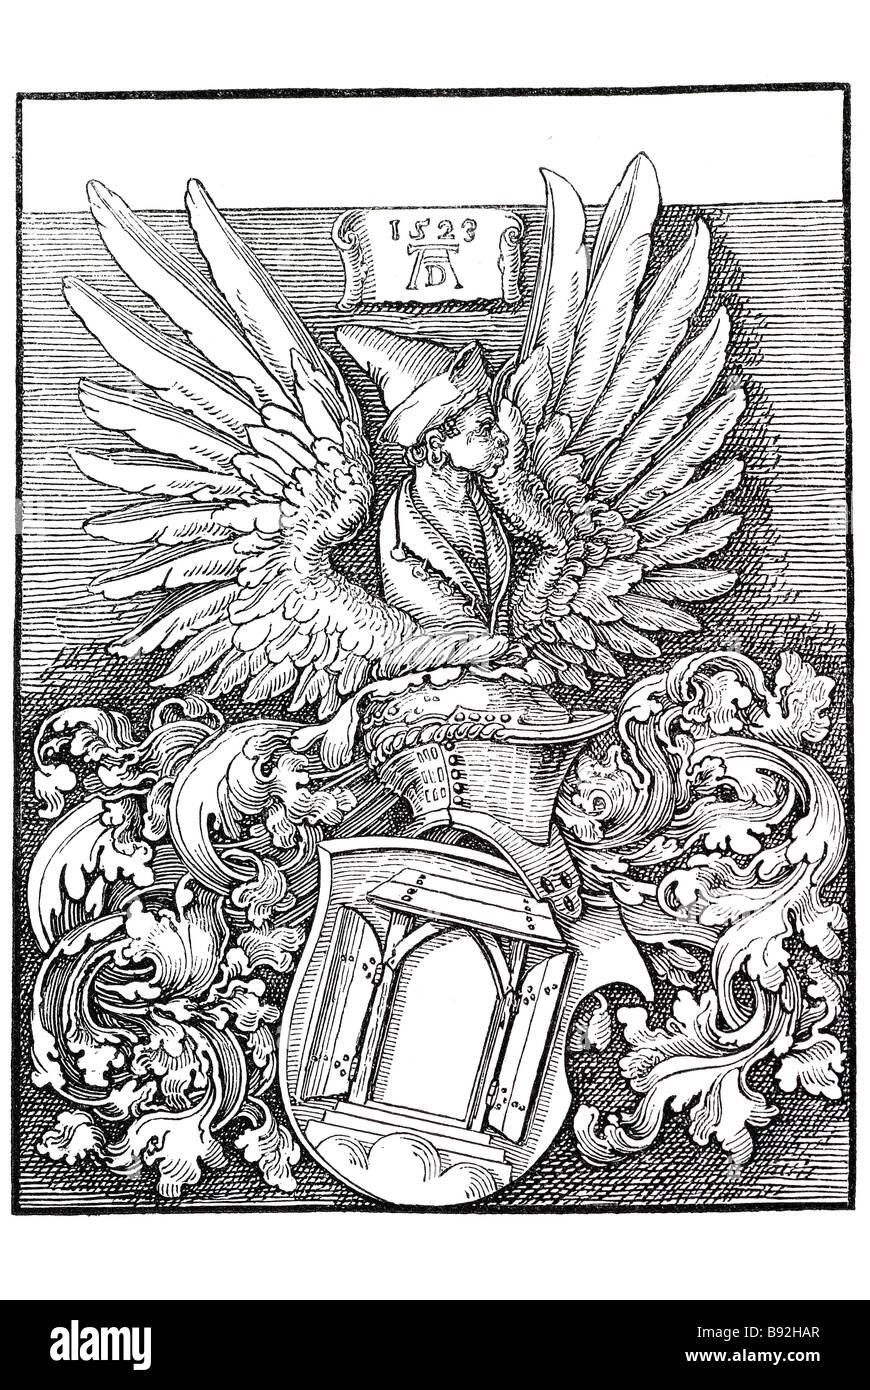 ducer's arms sheild coat of arms door wings helmet head torso wood carving block period dress scripture plates - Stock Image